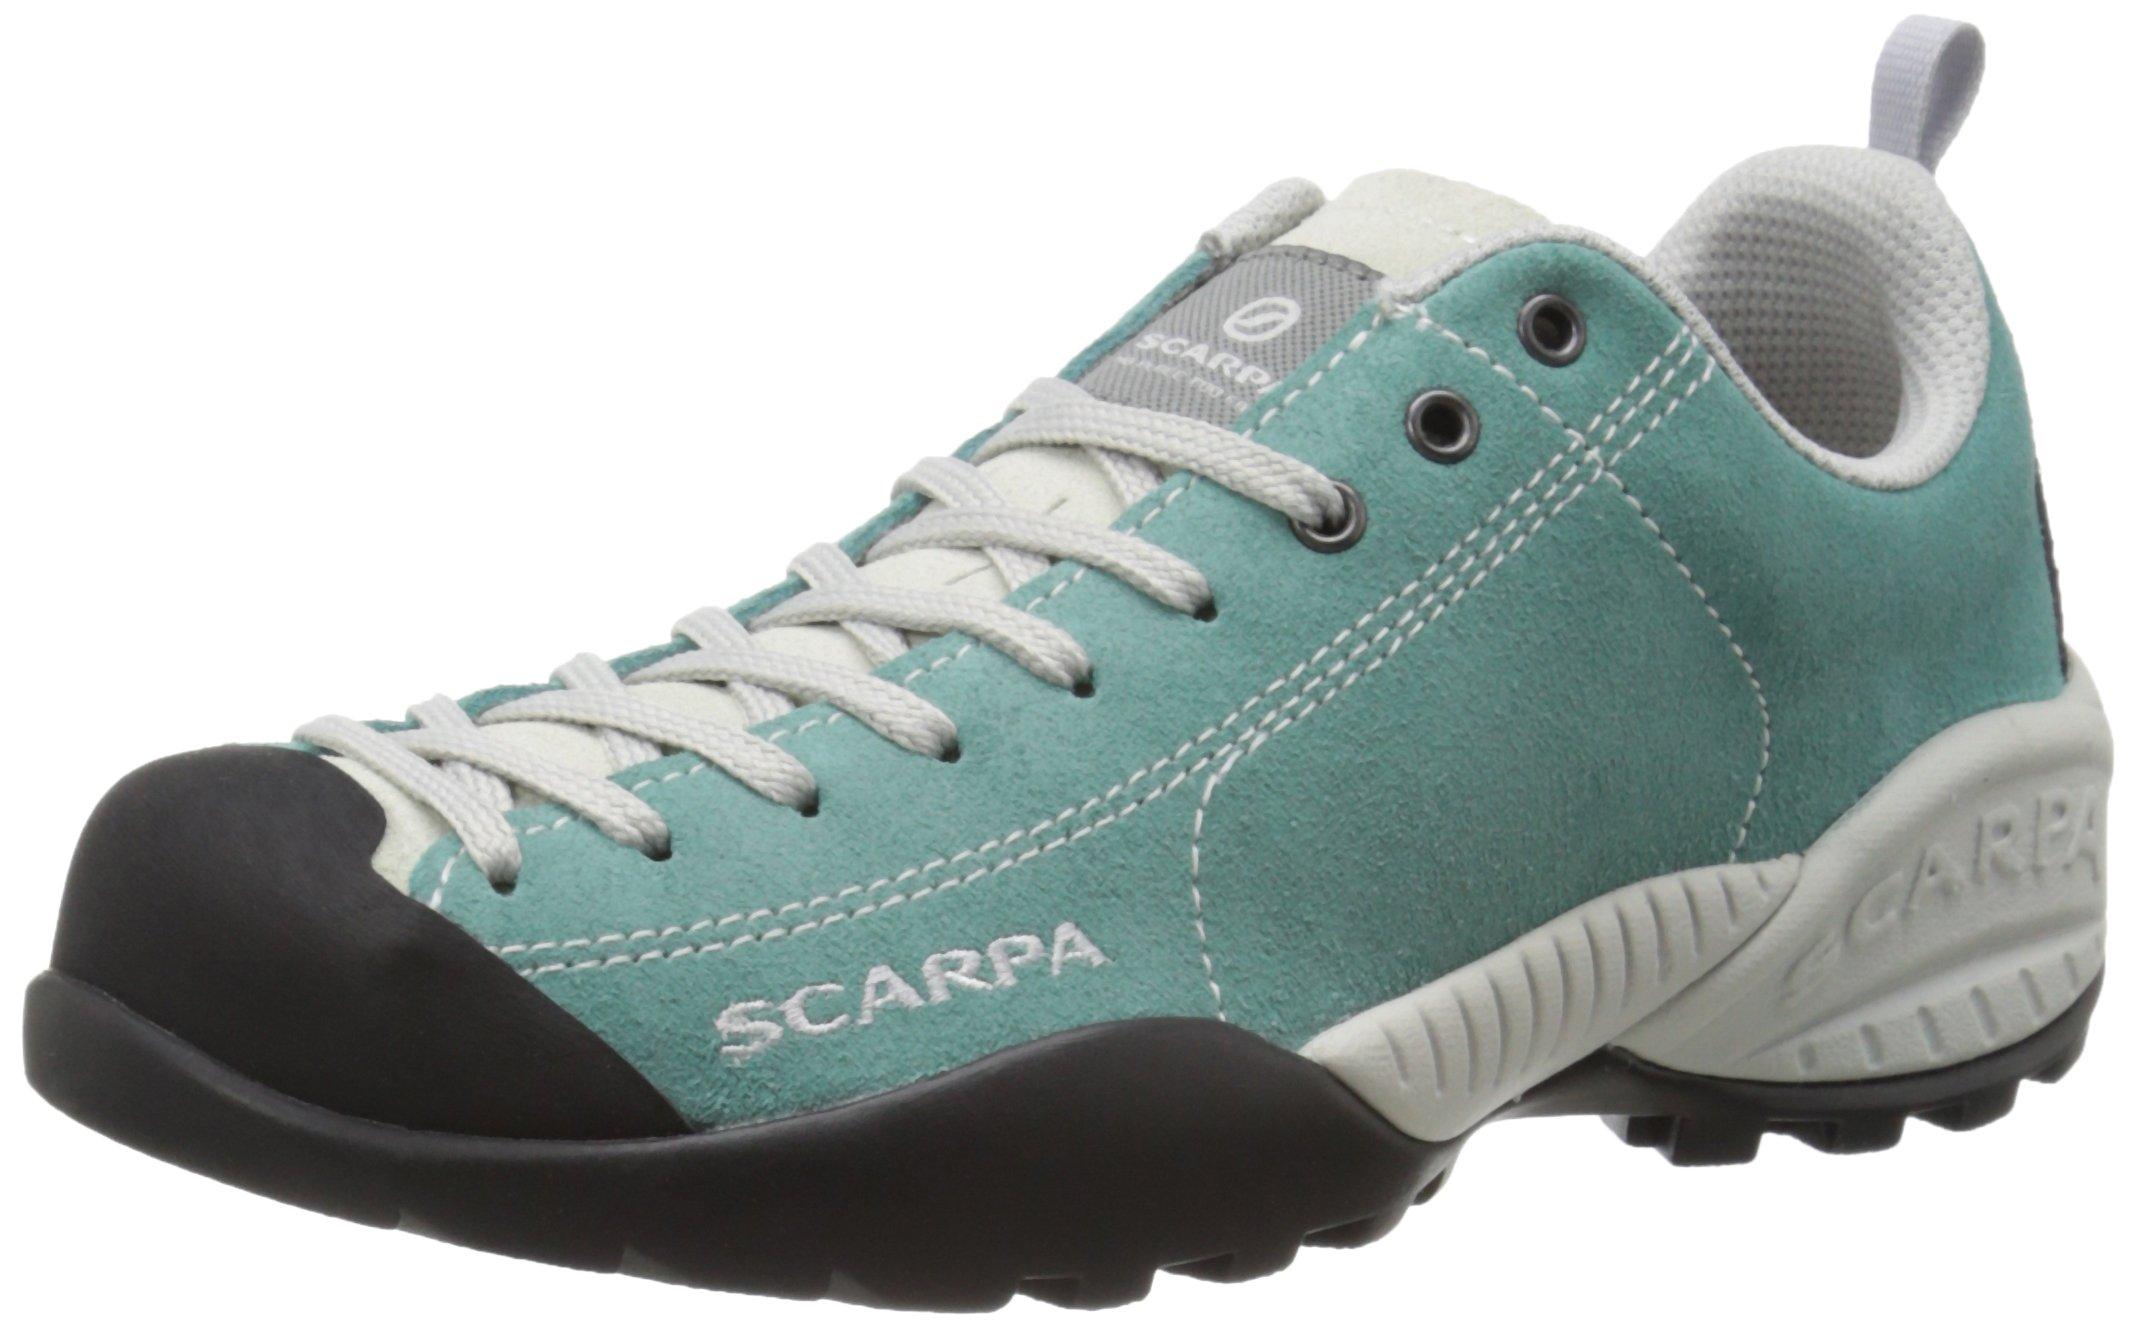 SCARPA Women's Mojito Casual Shoe, Lagoon, 37.5 EU/6.5 M US